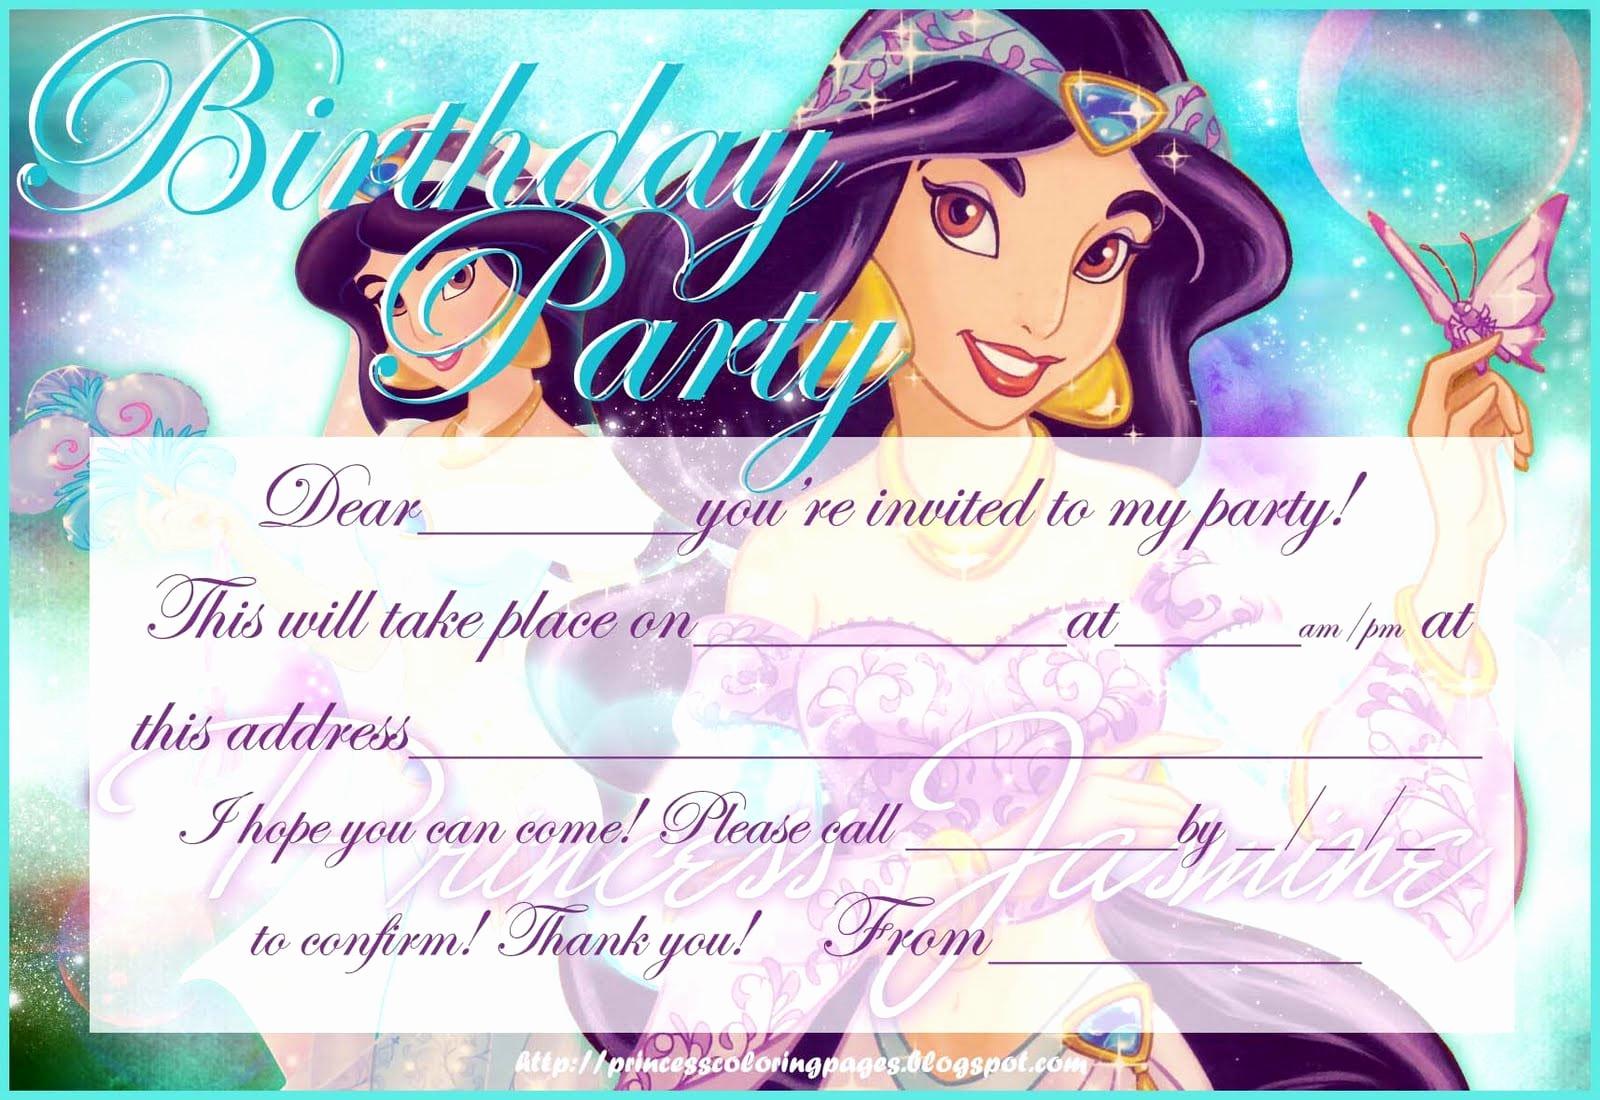 Disney Princess Invitation Templates Free Luxury Free Disney Princess Invitation Templates